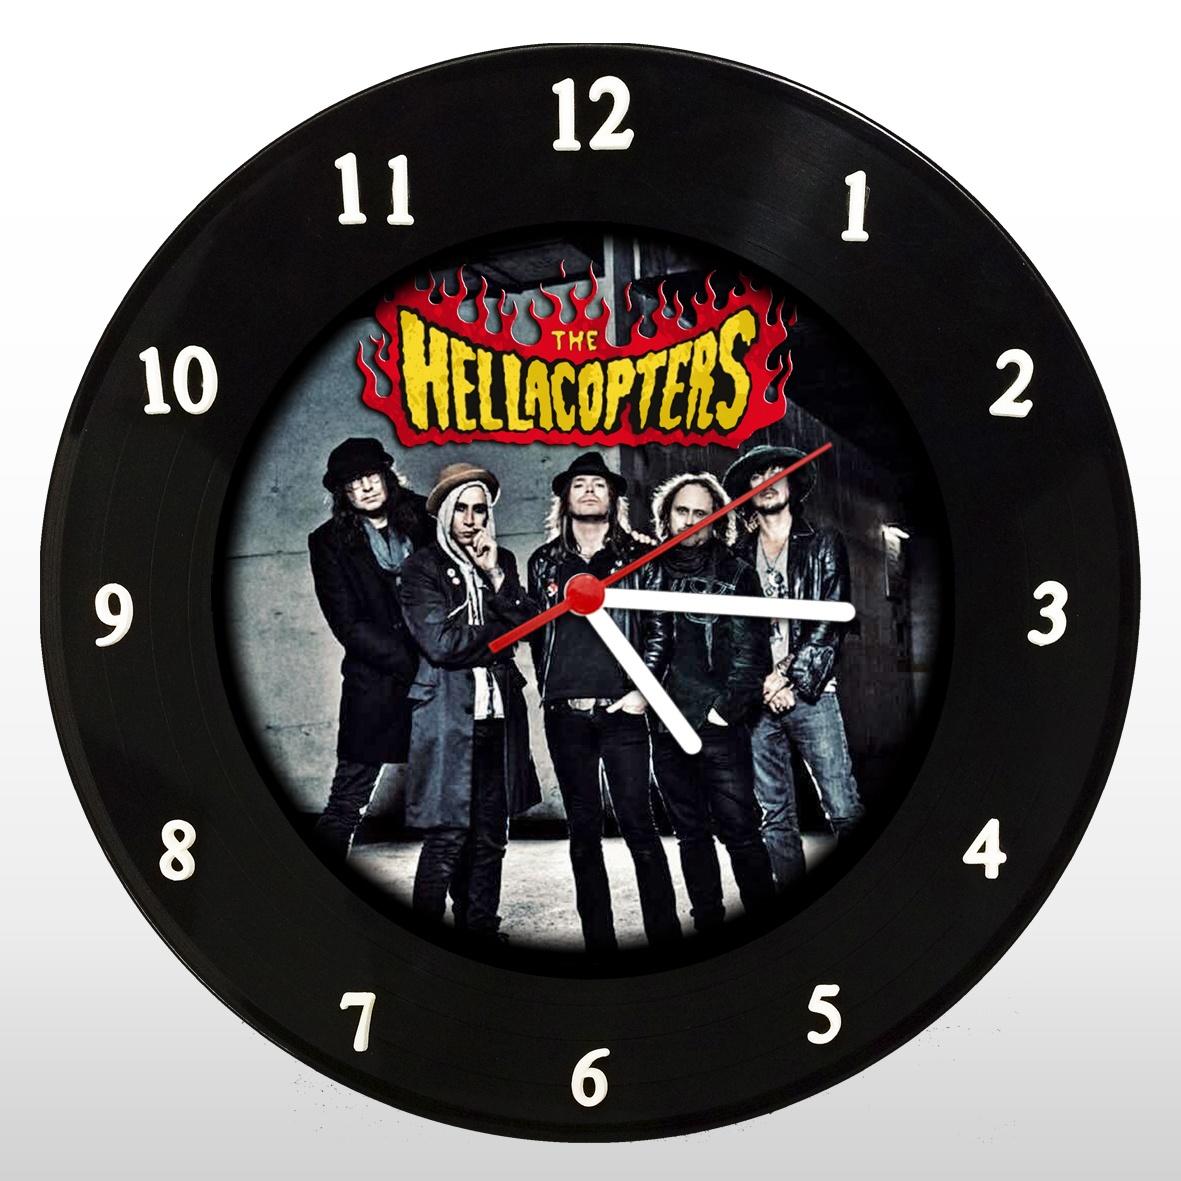 The Hellacopters - Relógio de Parede em Disco de Vinil - Mr. Rock